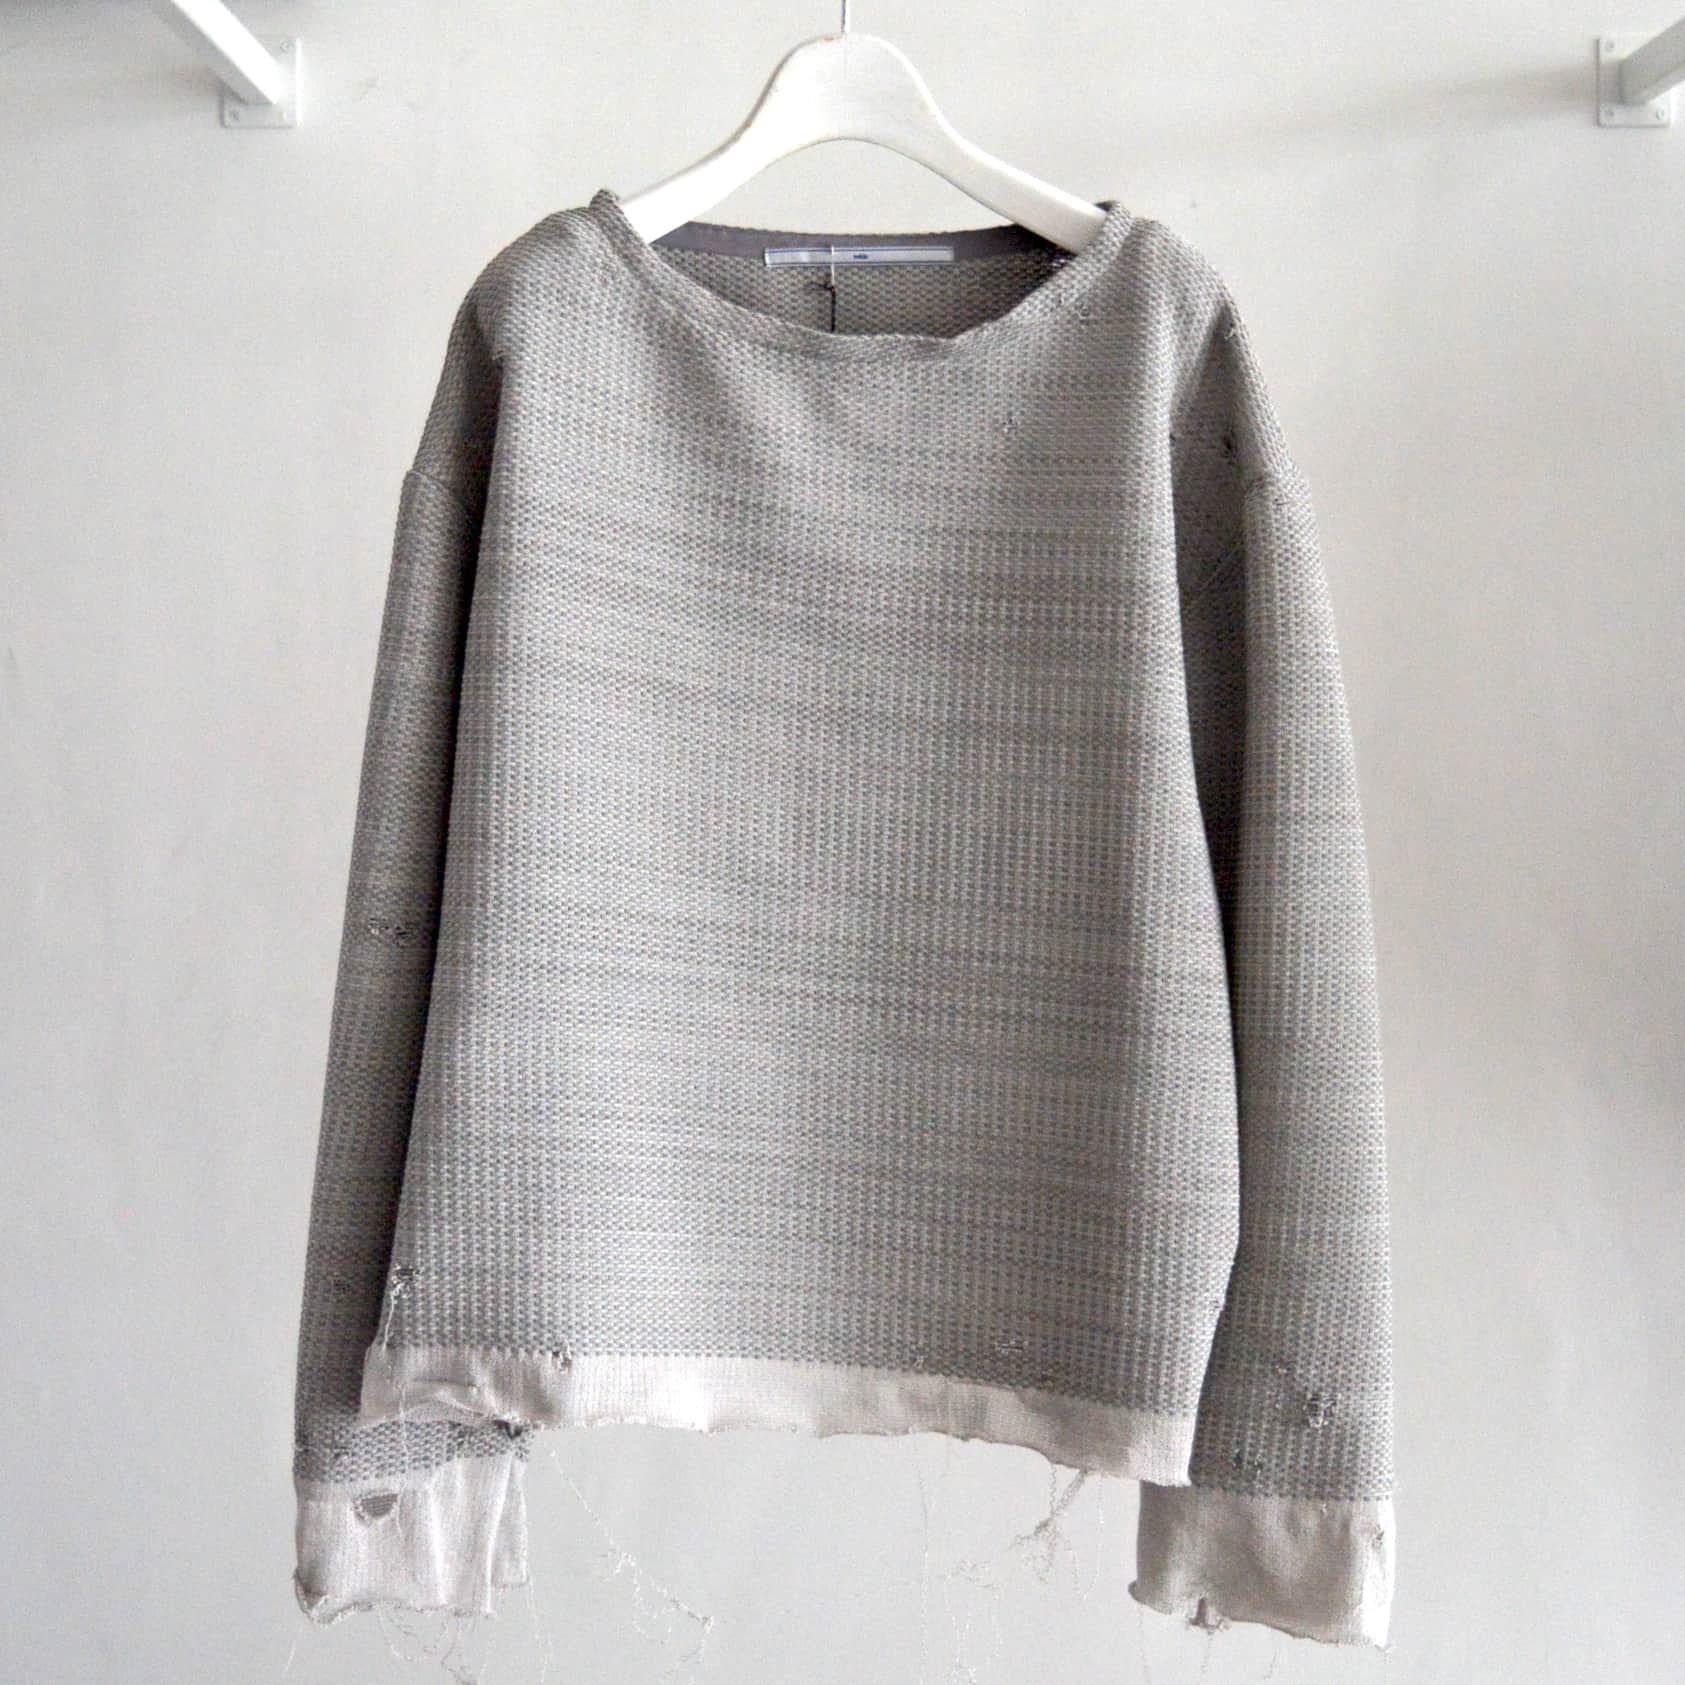 【tokio】Knitting Suede Pullover